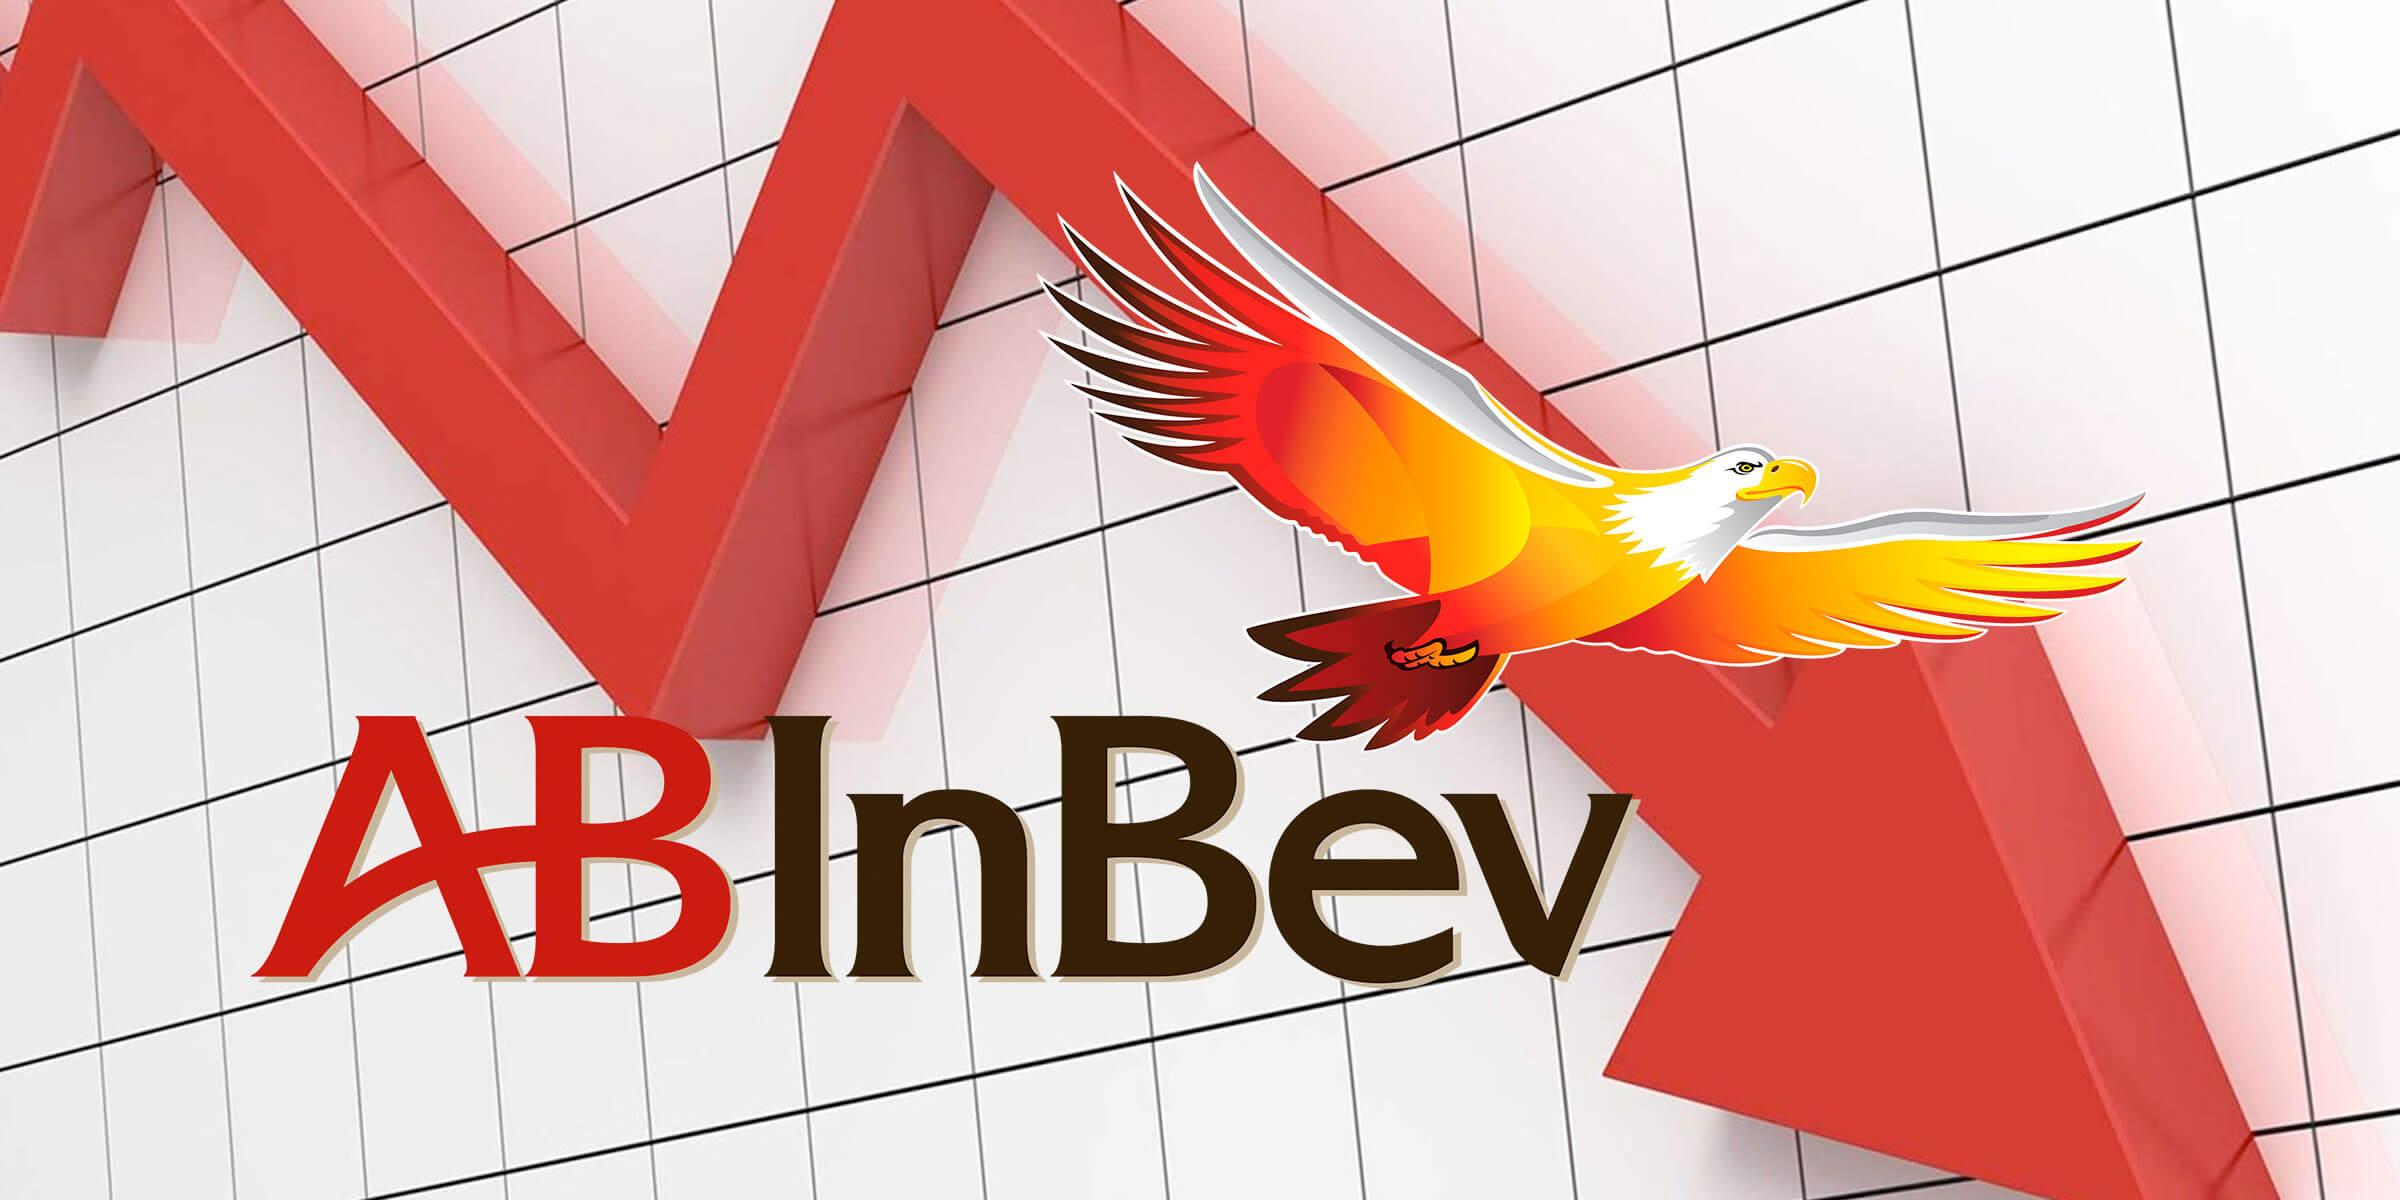 Anheuser-Busch InBev has experienced some decline recently.